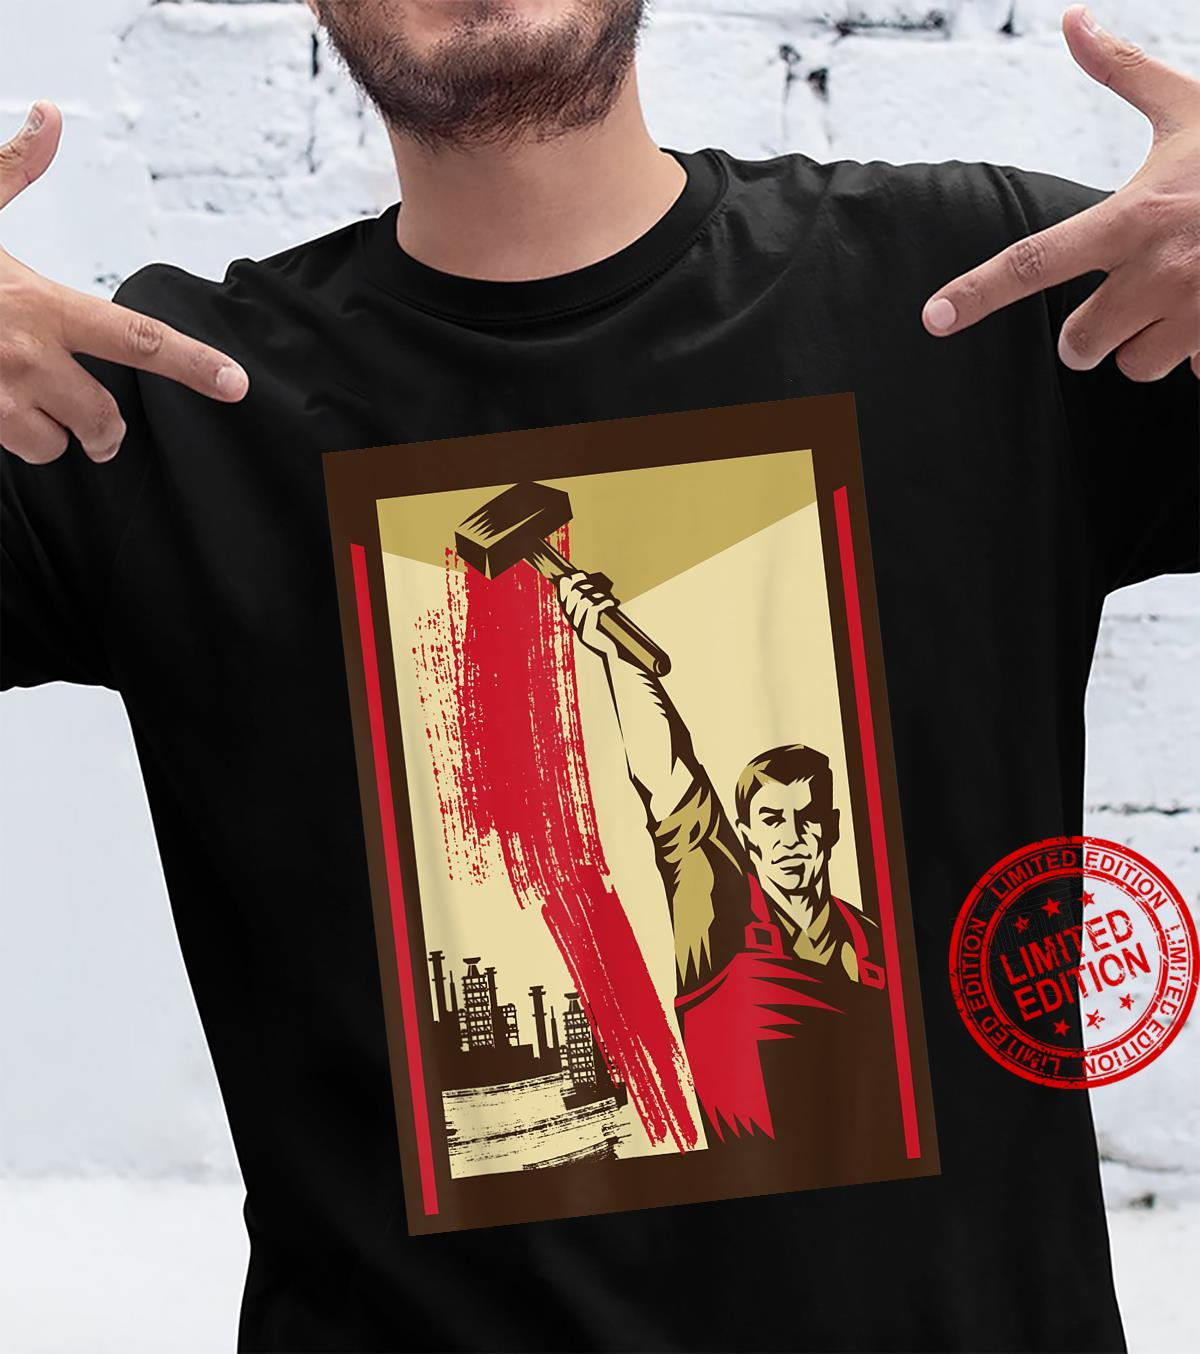 Worker with Hammer SOVI8 Vintage Propaganda. Shirt